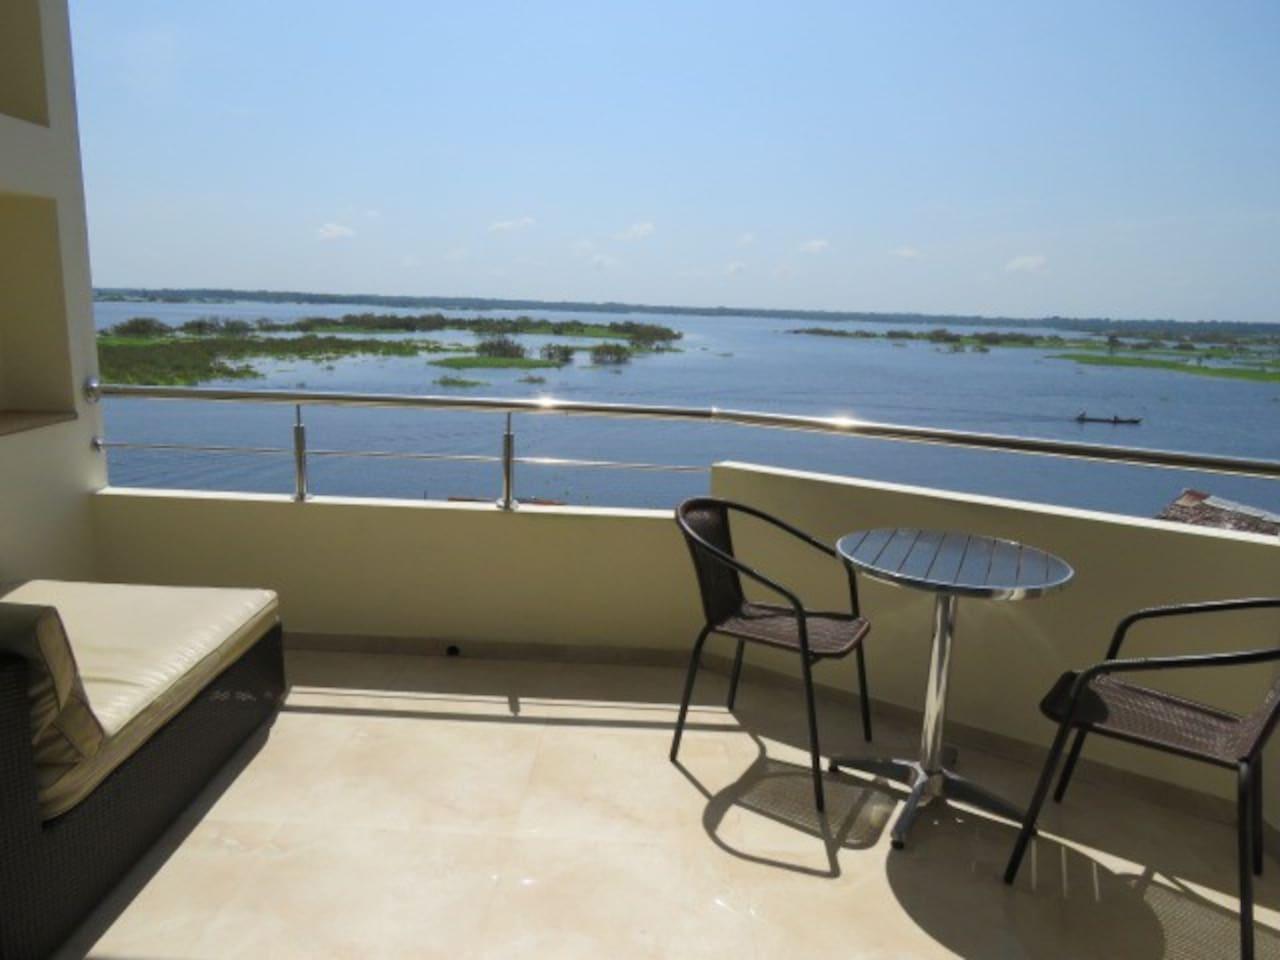 Riverside apartment balcony during high water season.